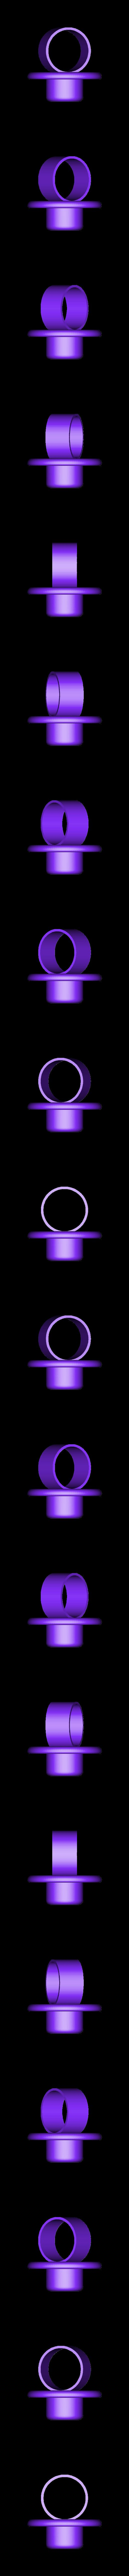 Candlering.stl Download free STL file Candlering • 3D print object, Rabeconstruction